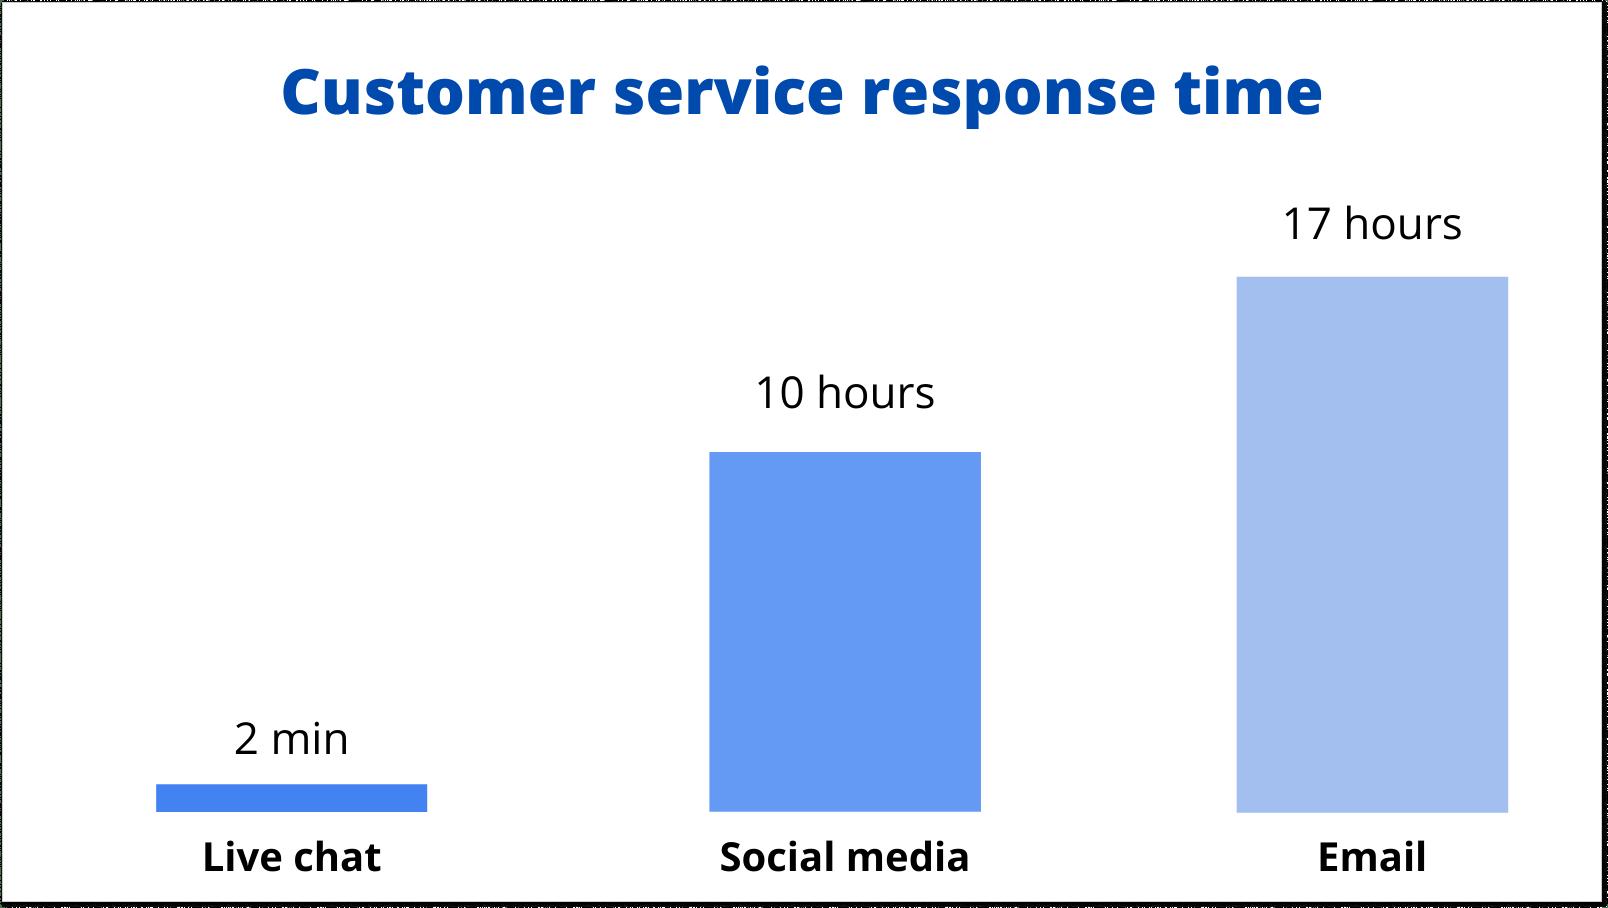 Customer service response time